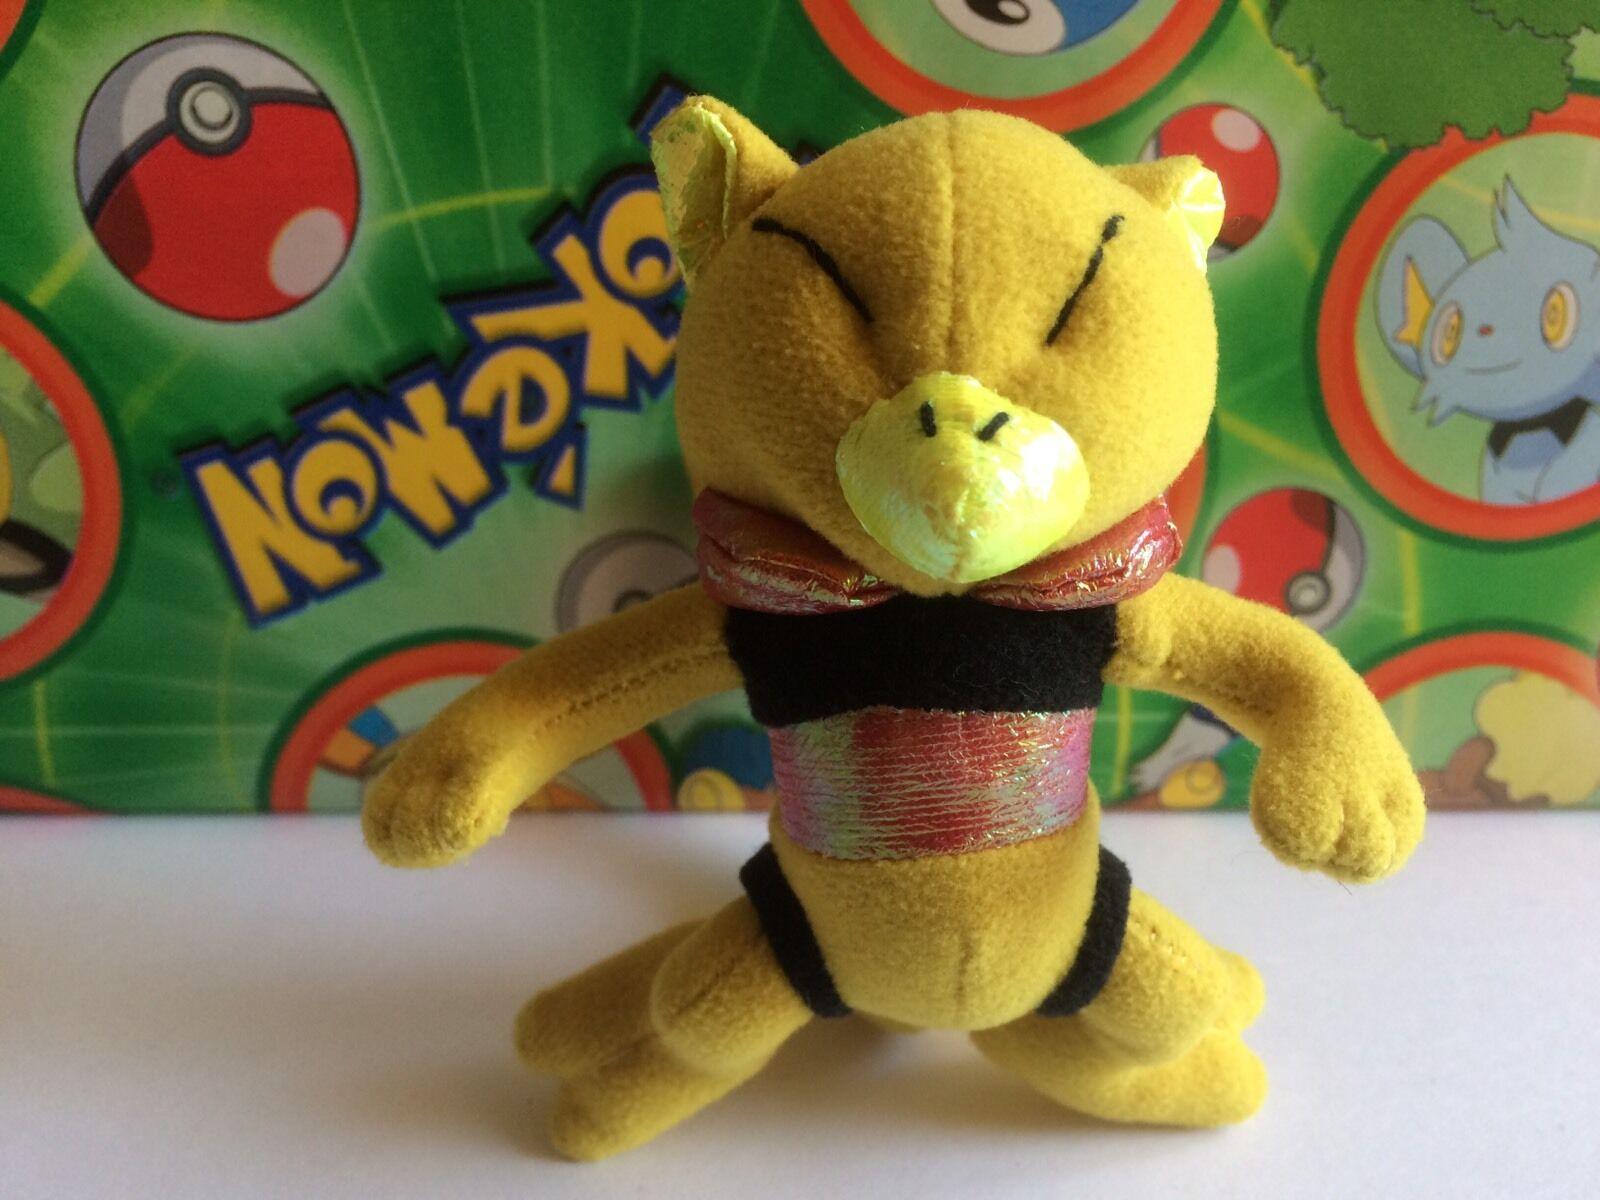 Pokemon Plush Abra Applause 1998 doll figure Stuffed tiere bean bag Spielzeug go